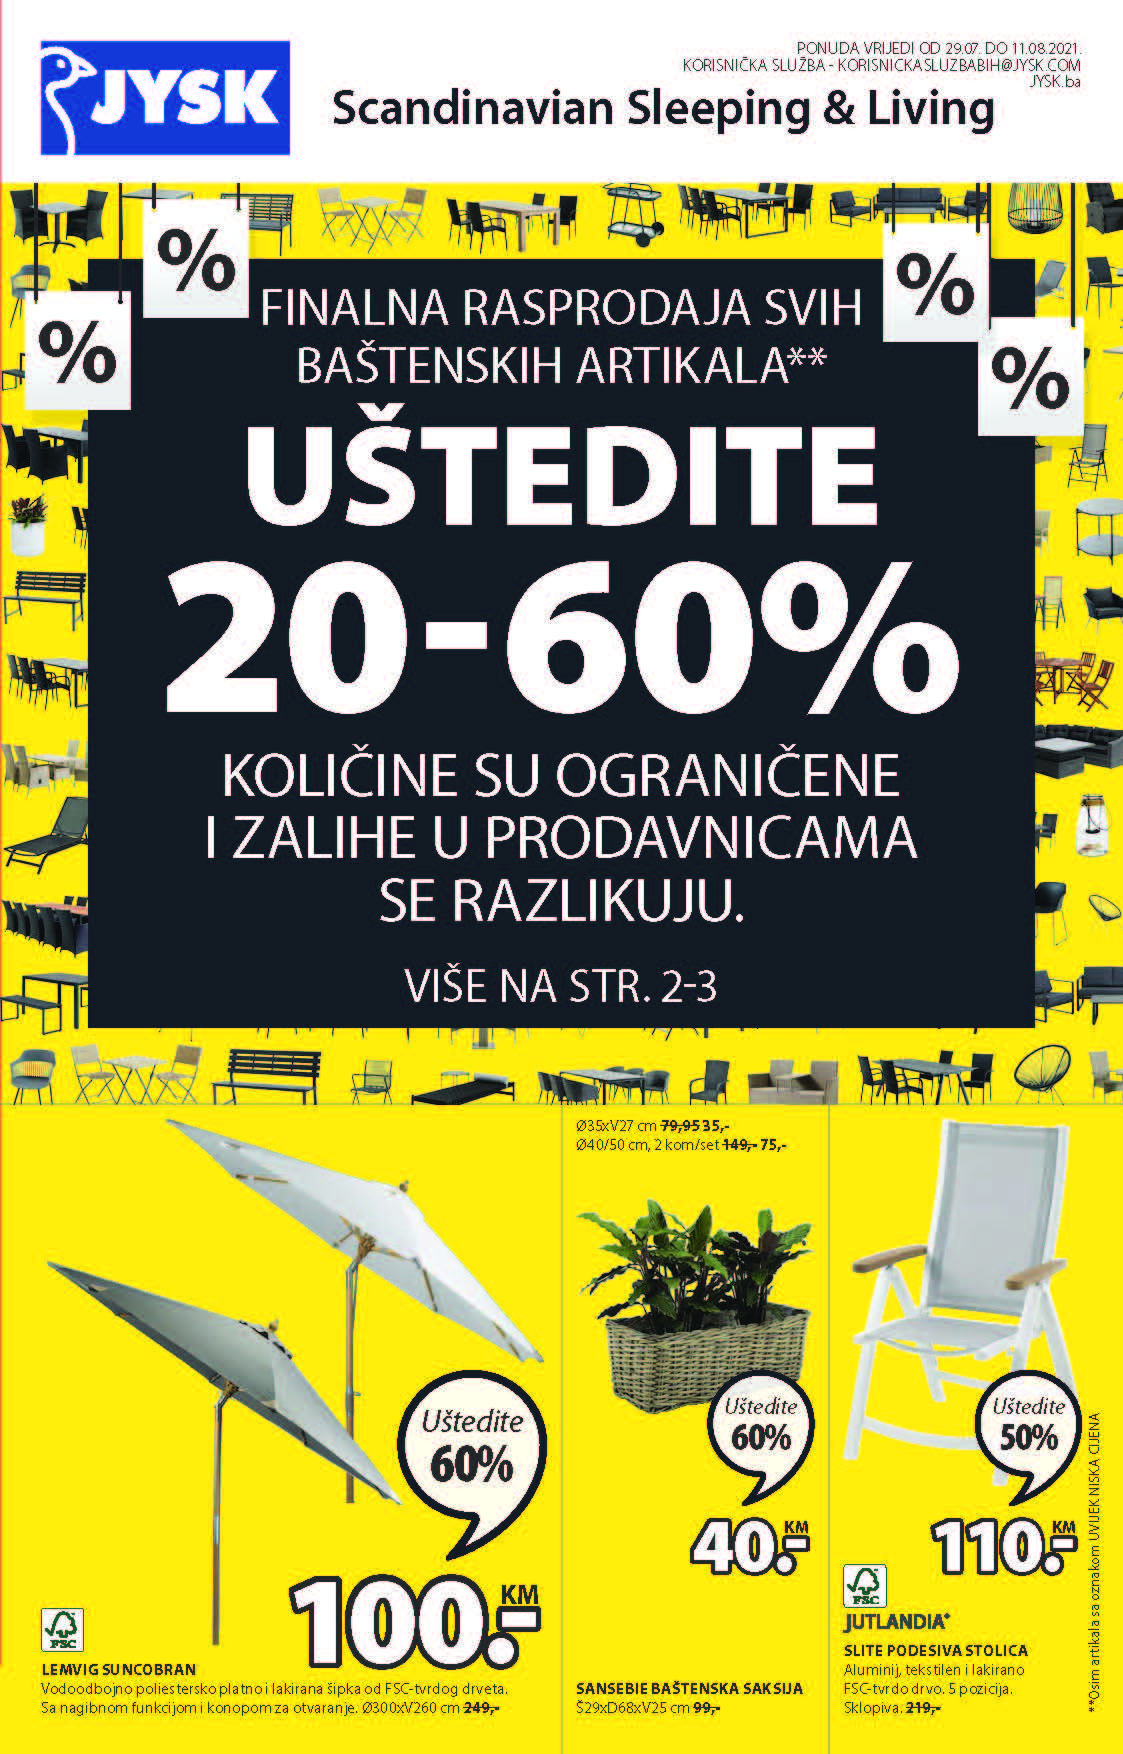 JYSK Katalog Akcijska rasprodaja AVGUST 2021 29.7.2021. 11.8.2021. Page 02 1